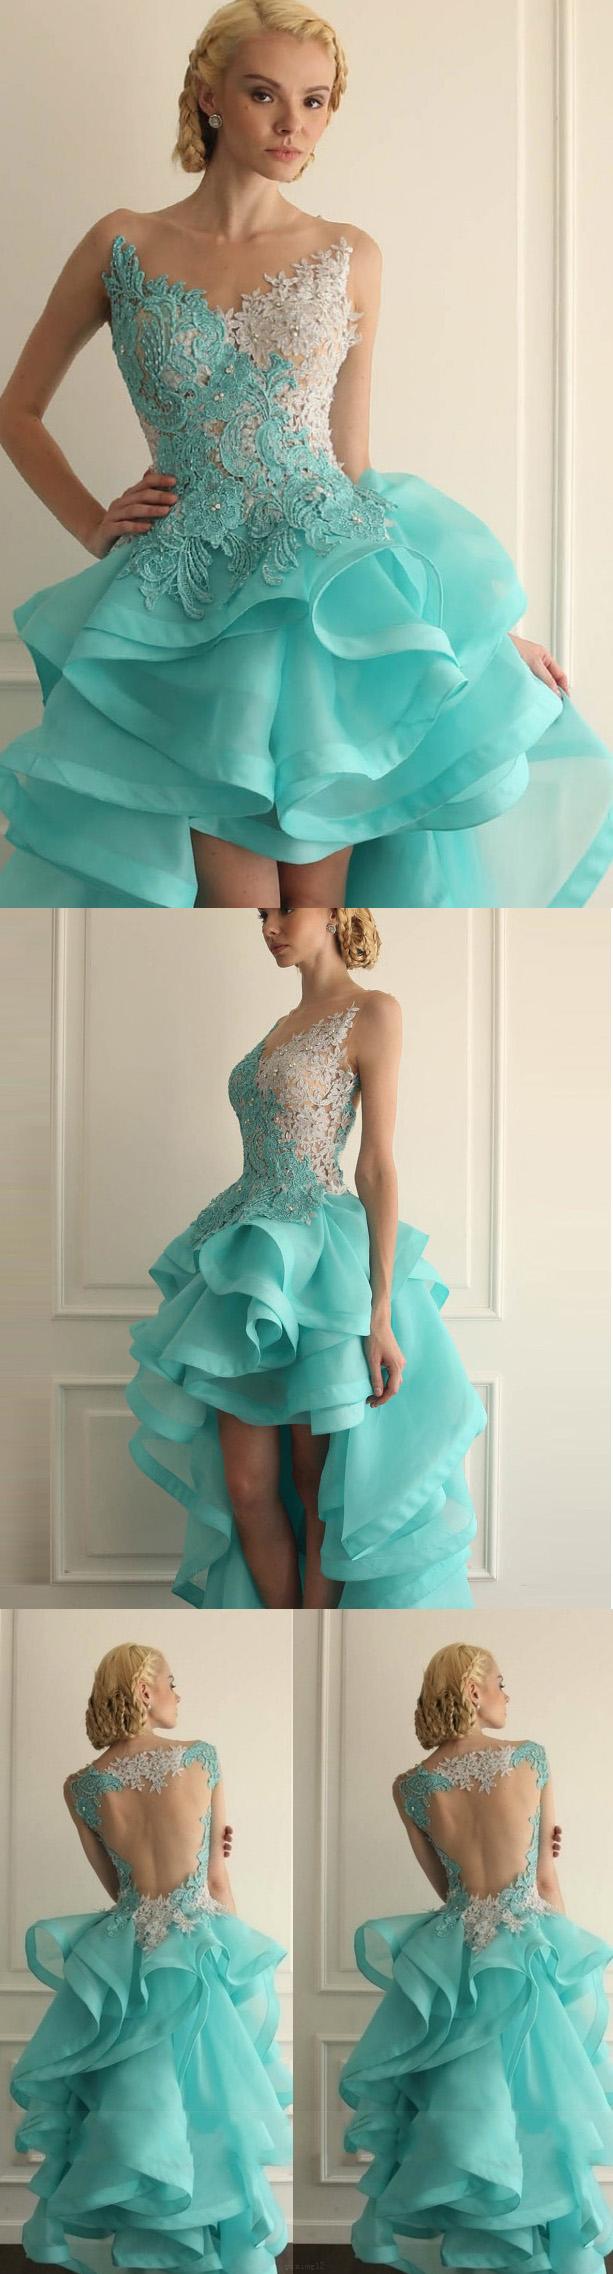 Discount short prom homecoming dress beautiful light blue prom